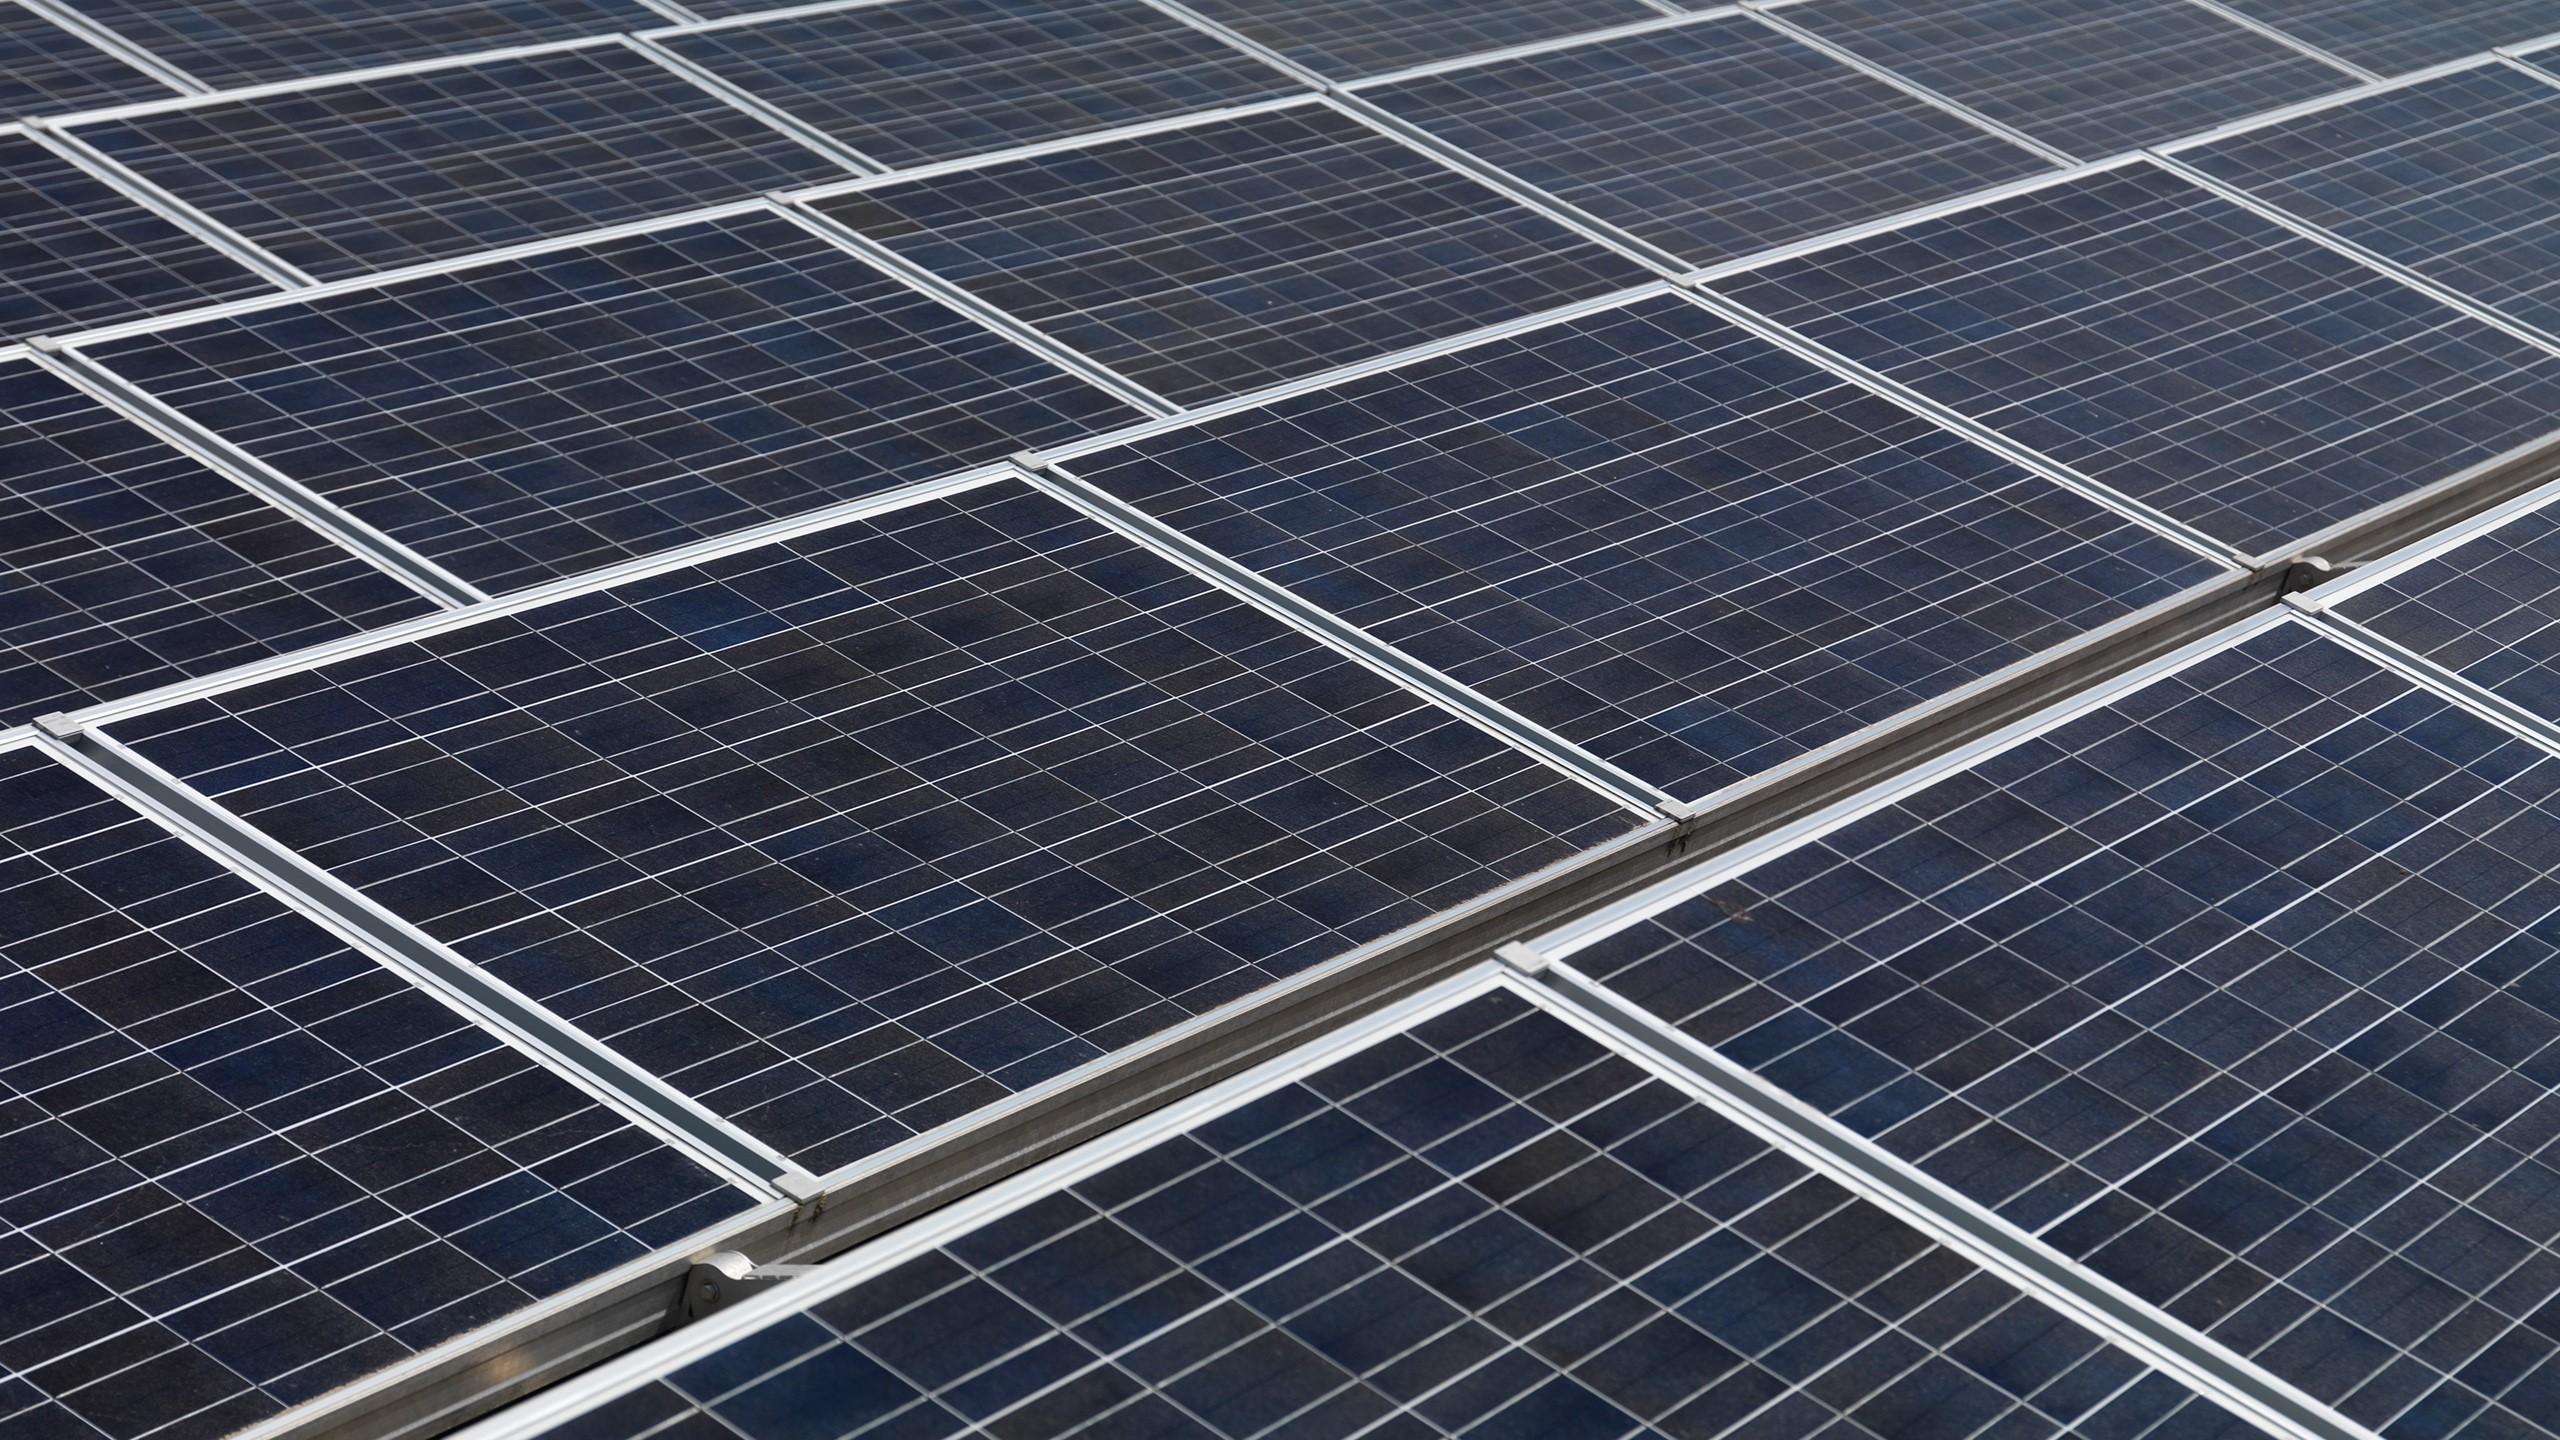 General 2560x1440 solar power power plant technology